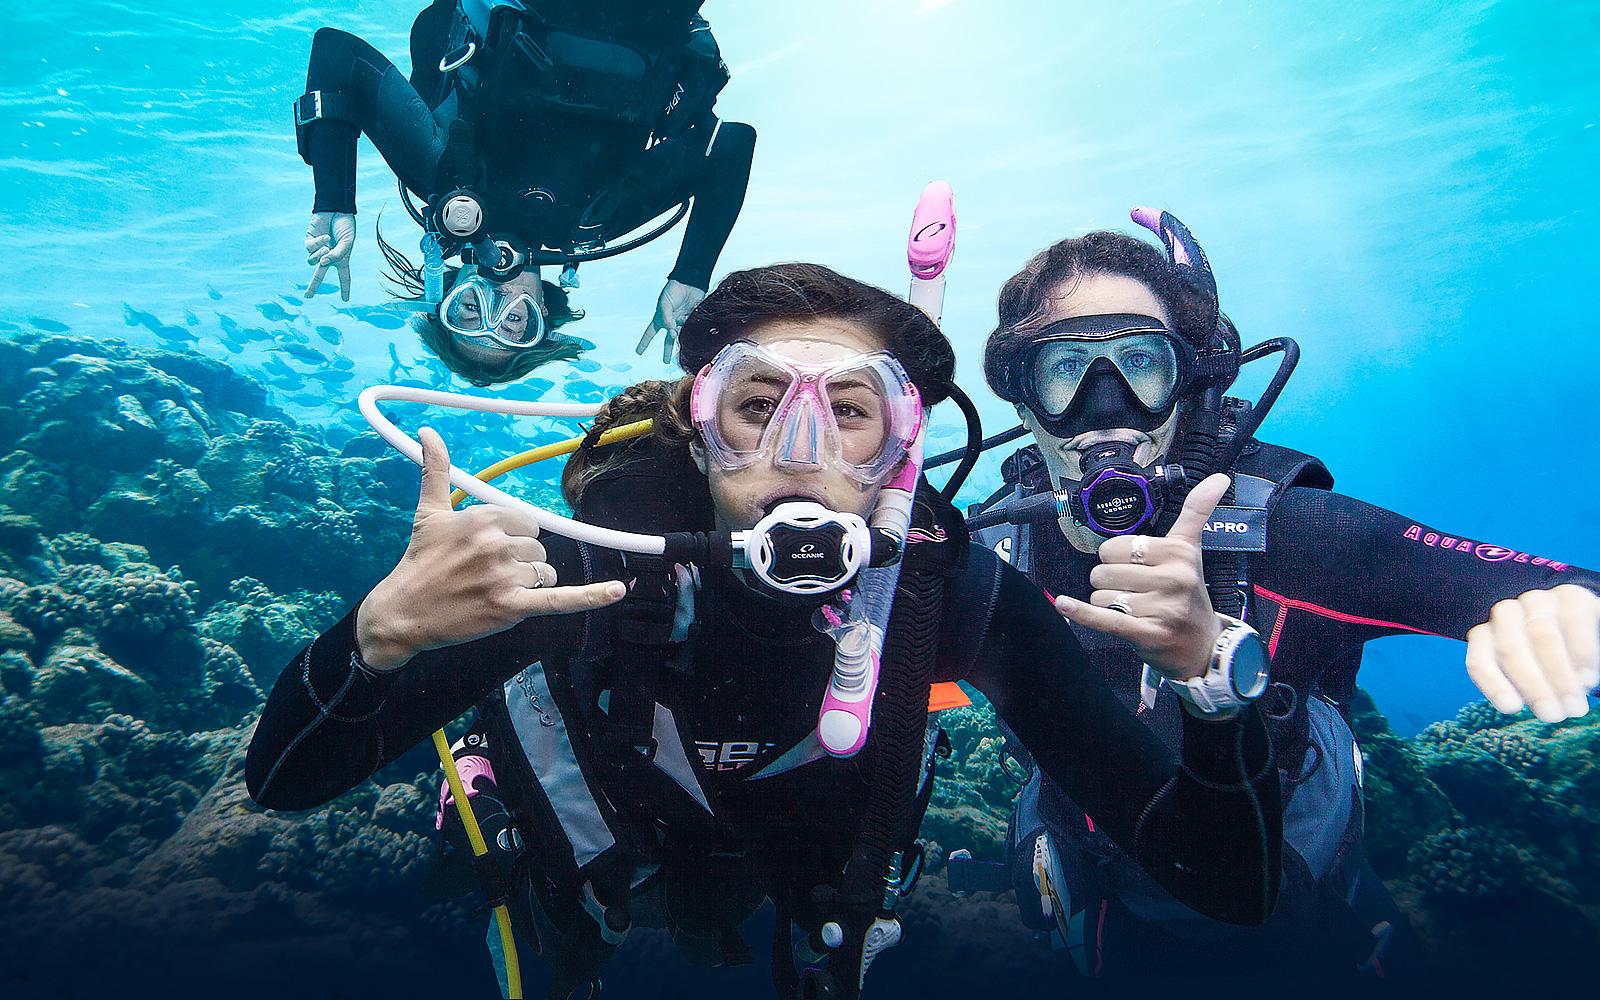 backpacktheglobe_diver_open_water.jpg